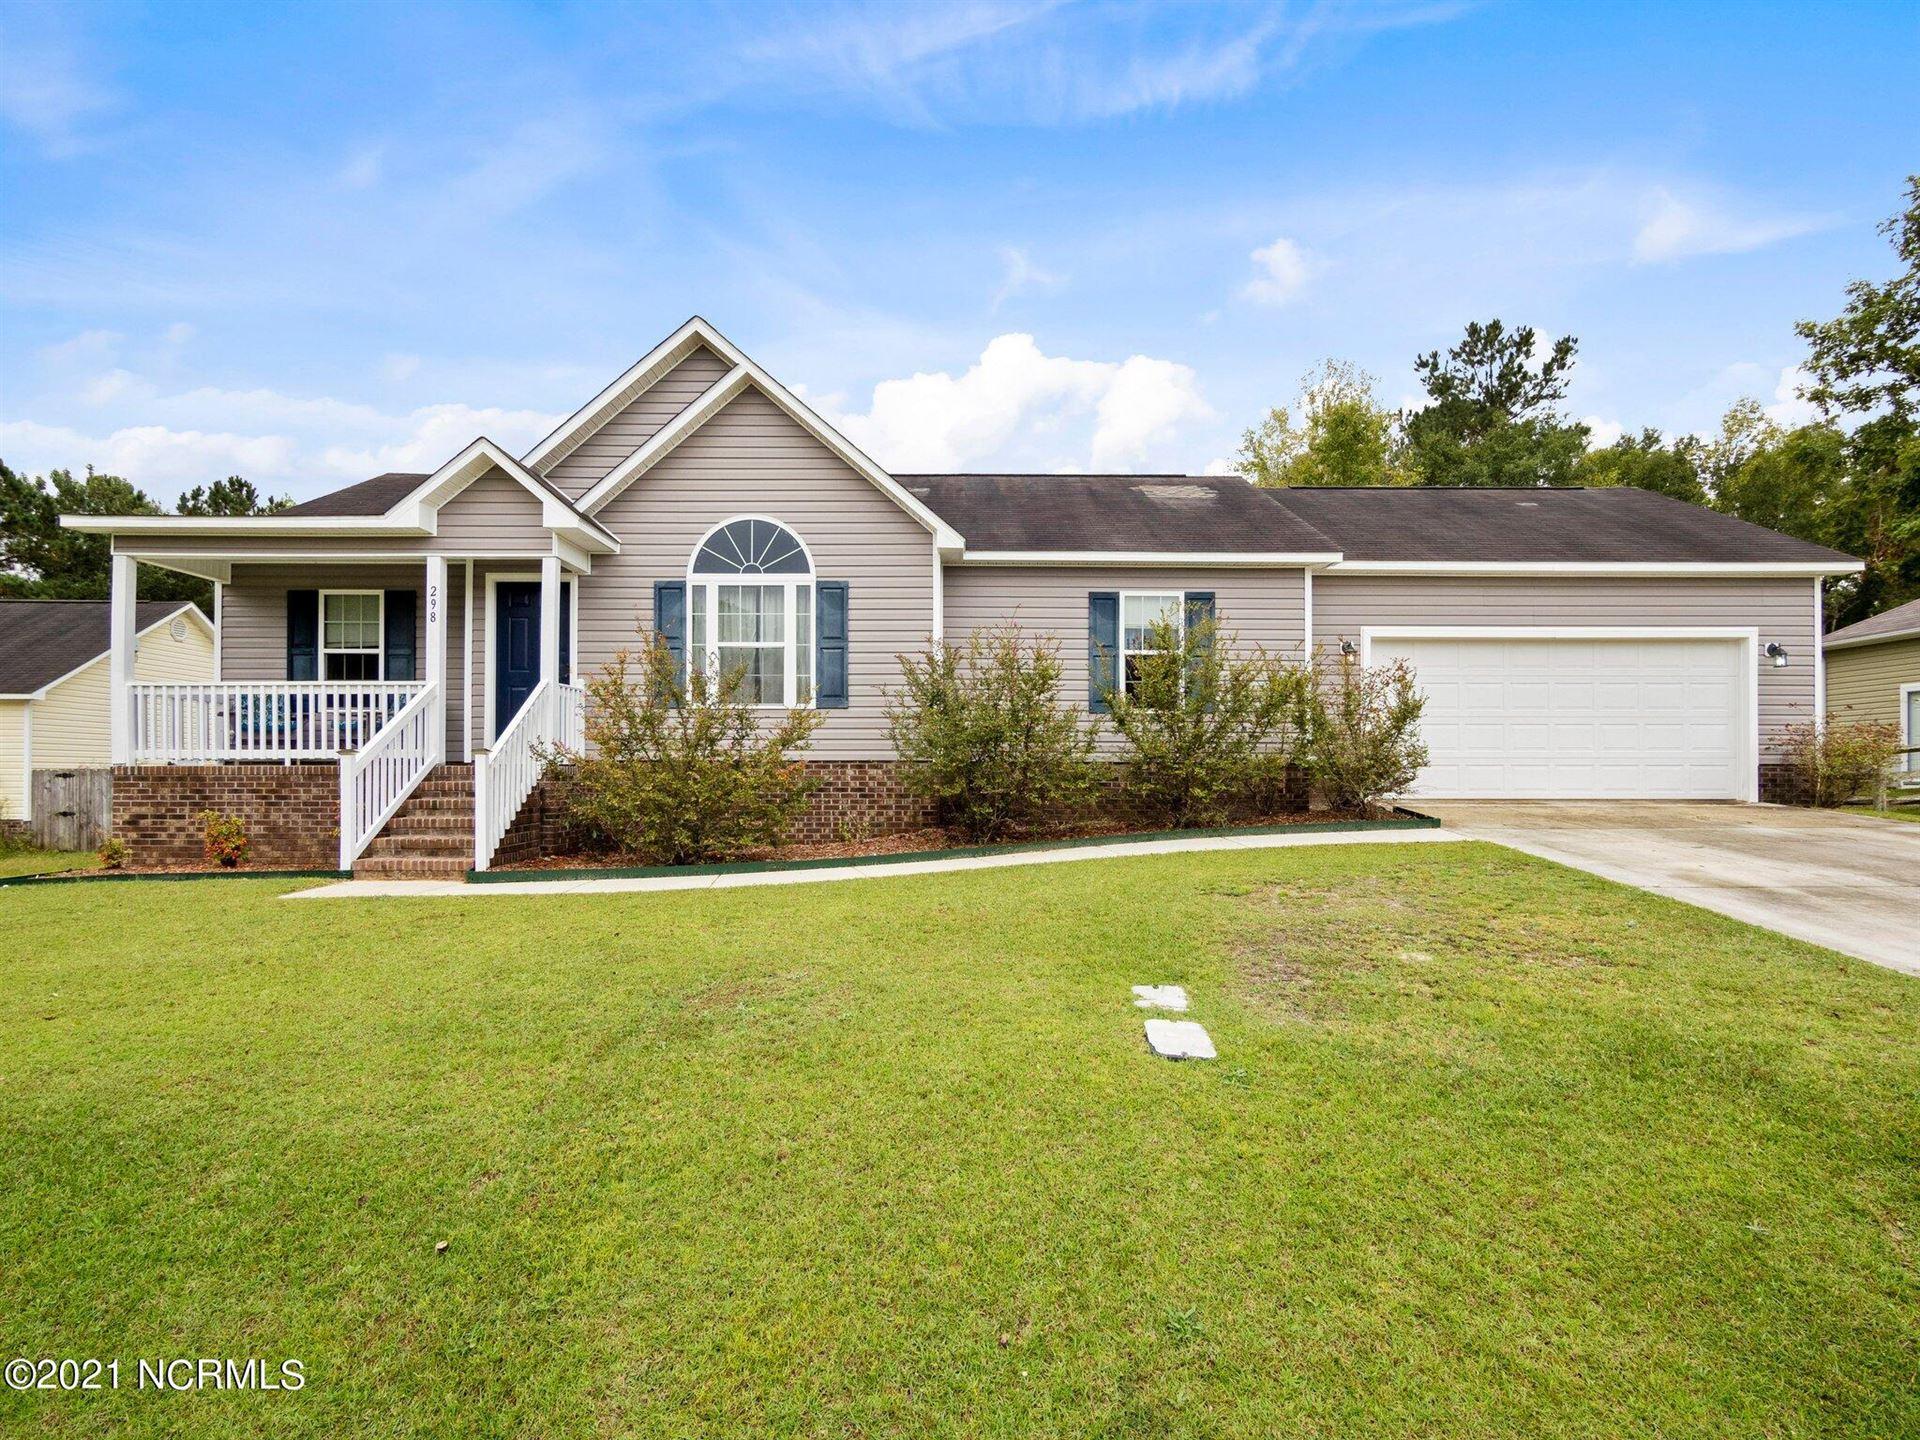 Photo of 298 Brookstone Way, Jacksonville, NC 28546 (MLS # 100295029)